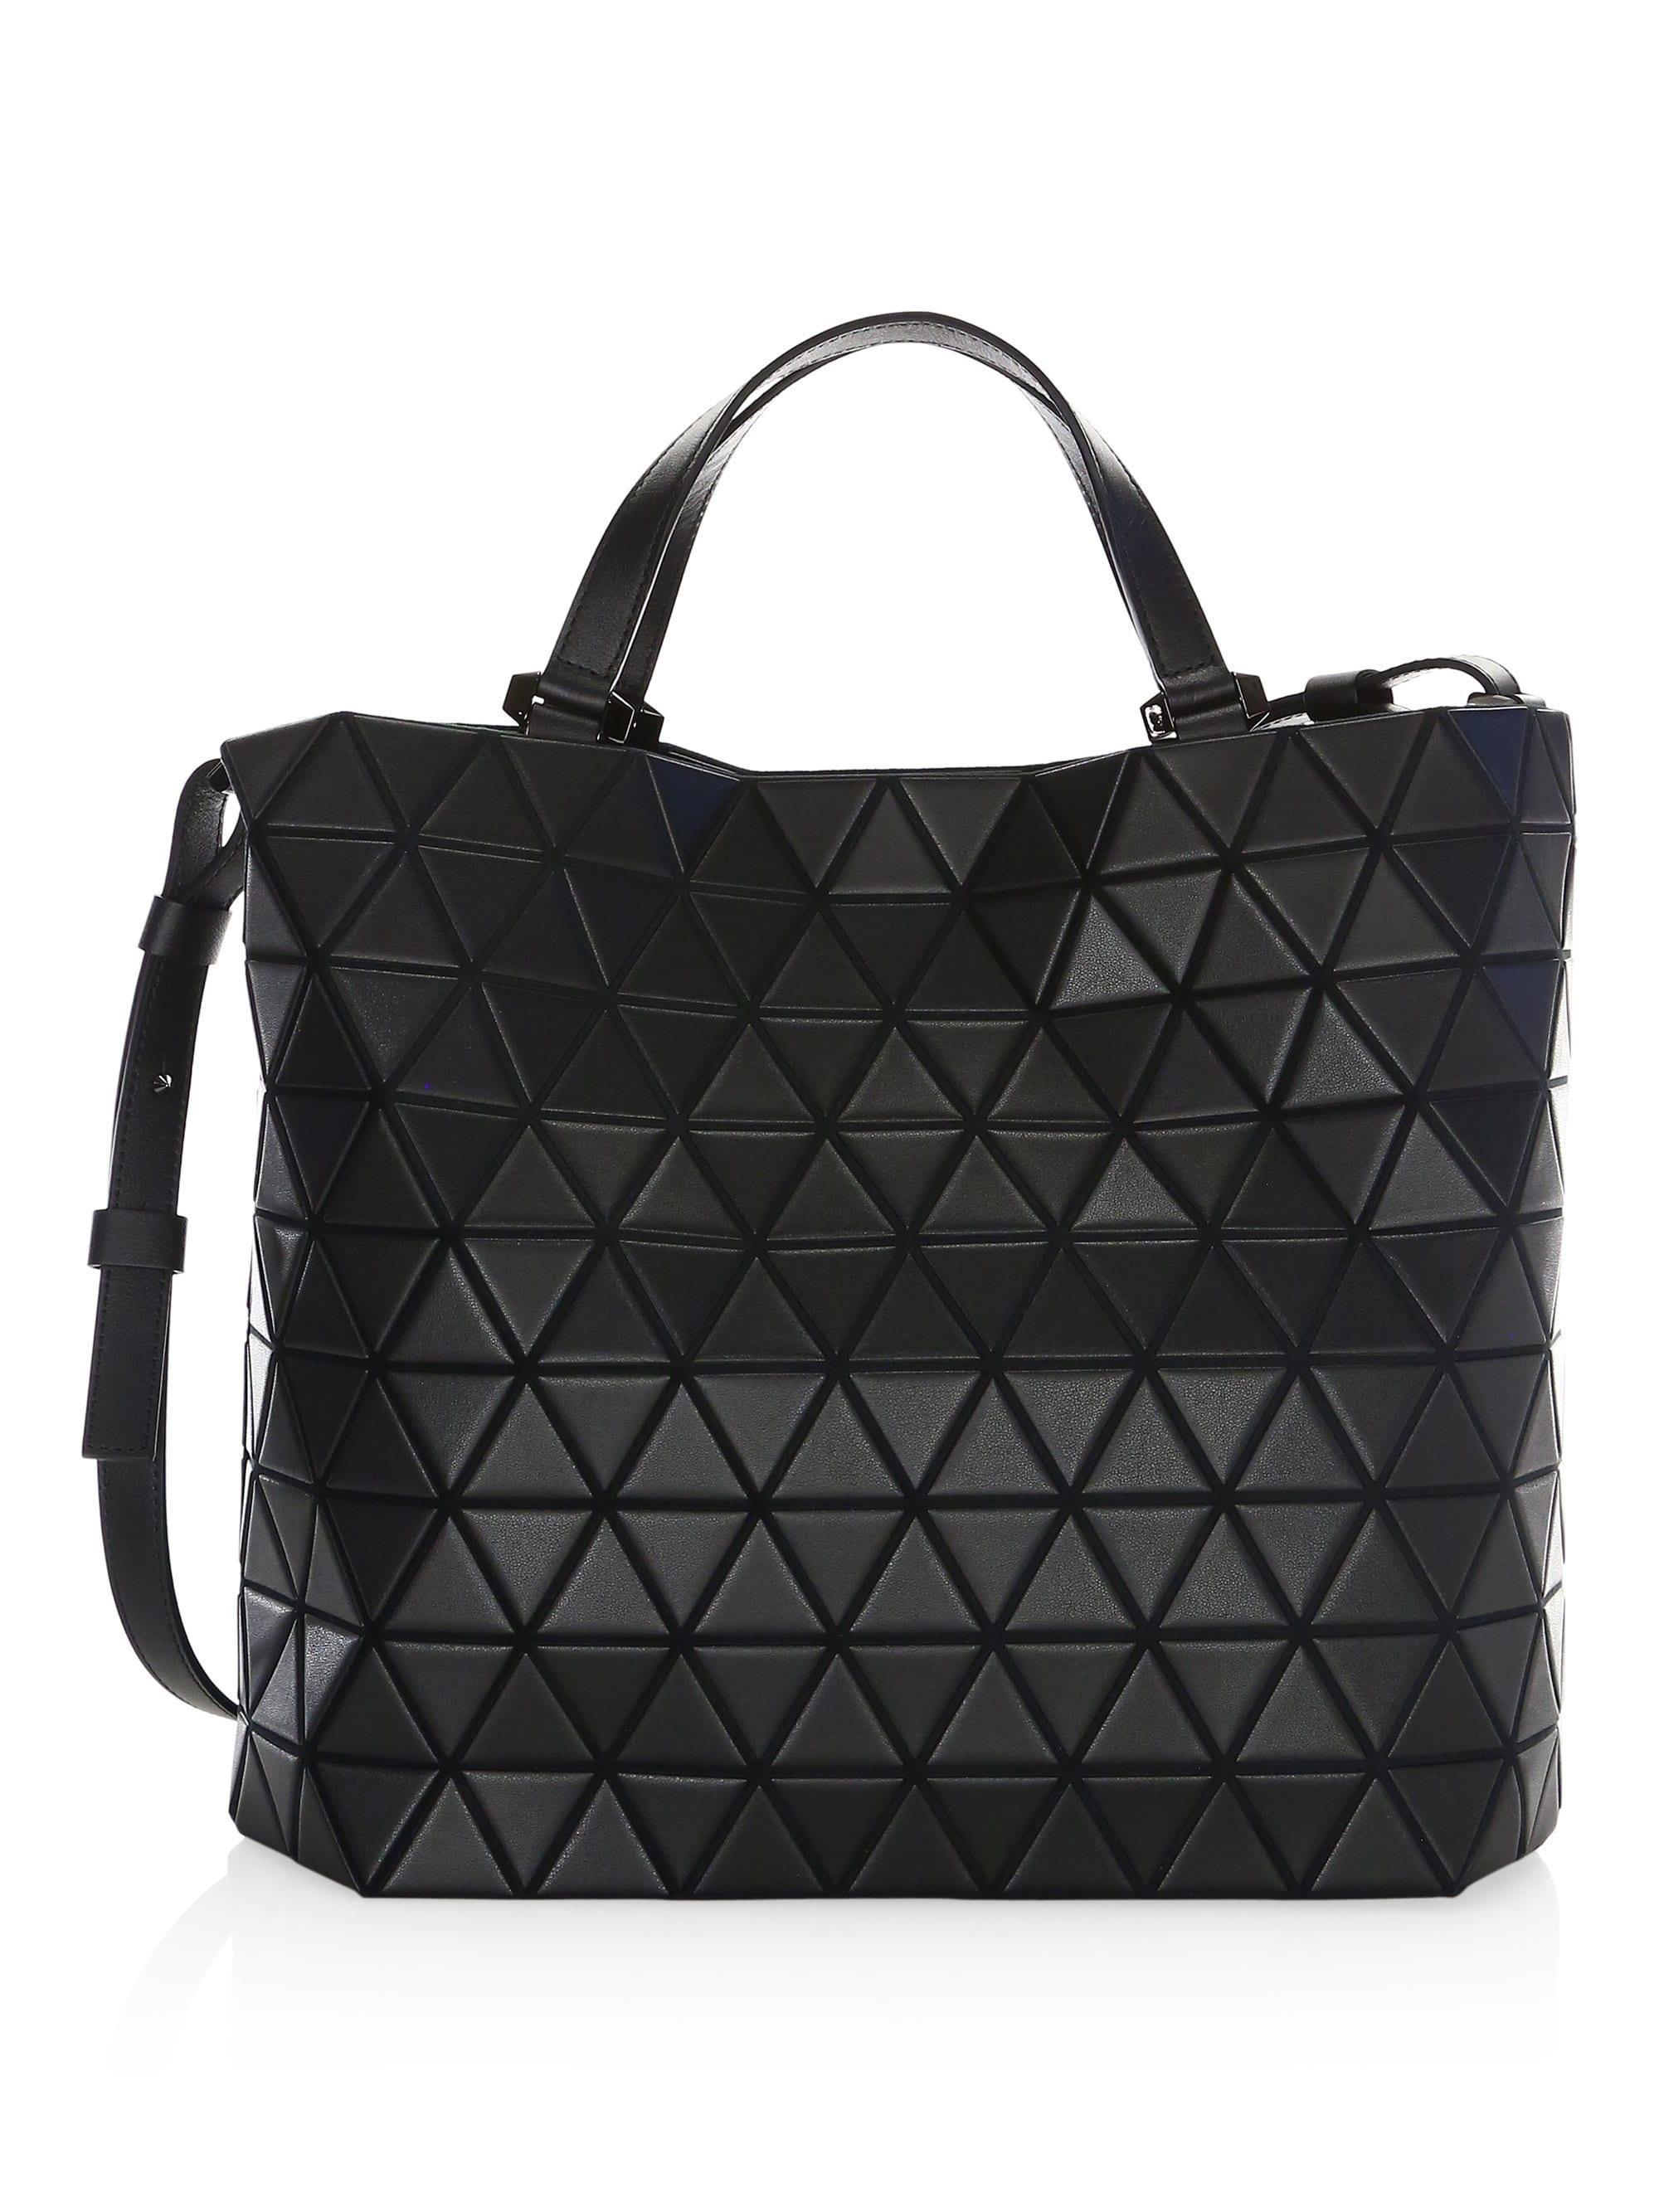 ed909097de Bao Bao Issey Miyake Women s Crystal Matte Leather Tote - Black in ...